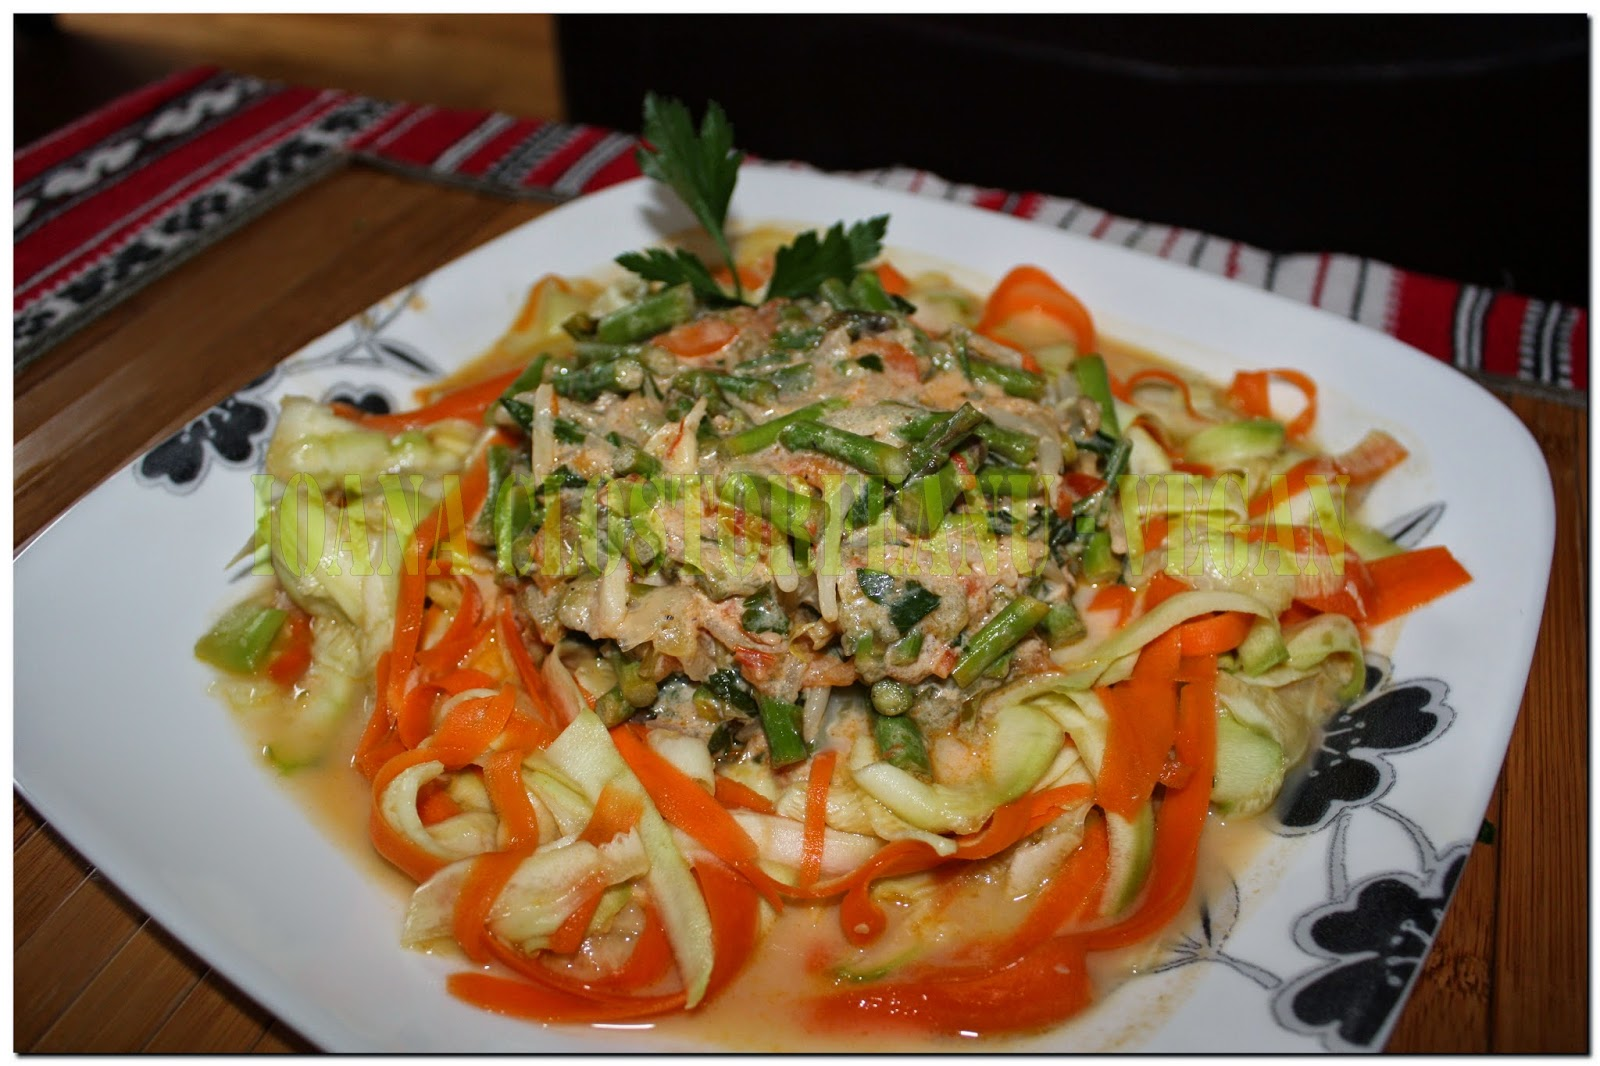 vegetarian recipes with photos vegan recipes animal protein free easy vegetarians recipes. Black Bedroom Furniture Sets. Home Design Ideas